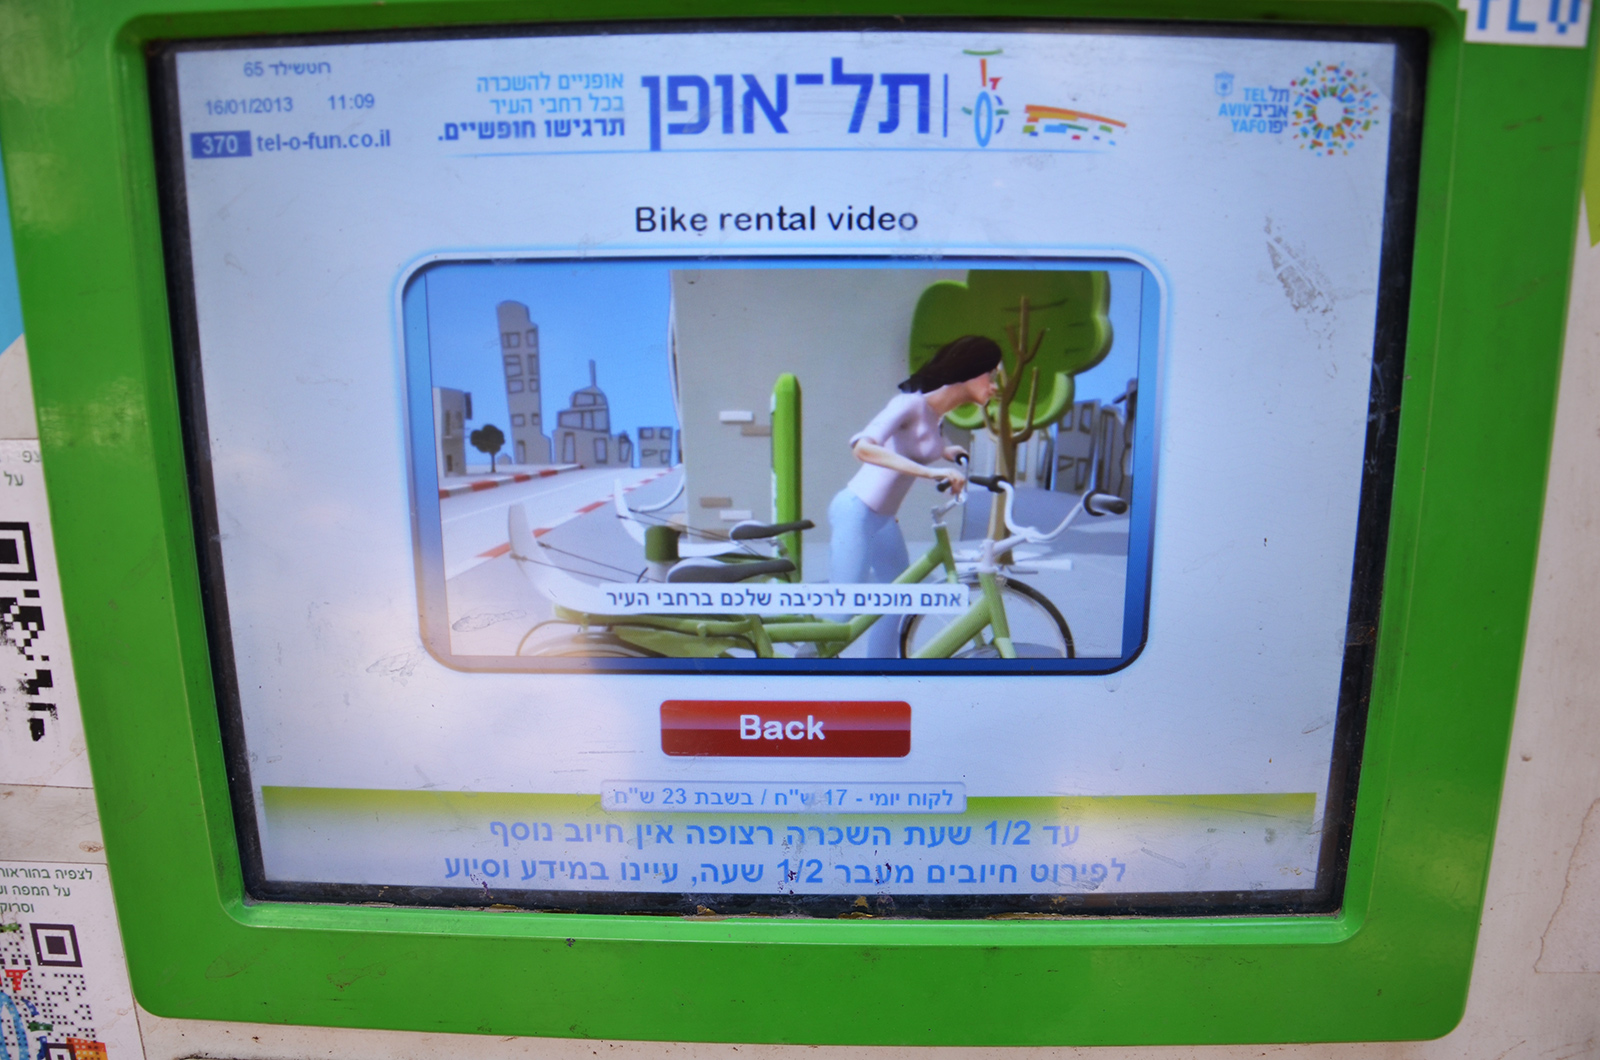 online půjčovna kol, Tel-Aviv, Izrael